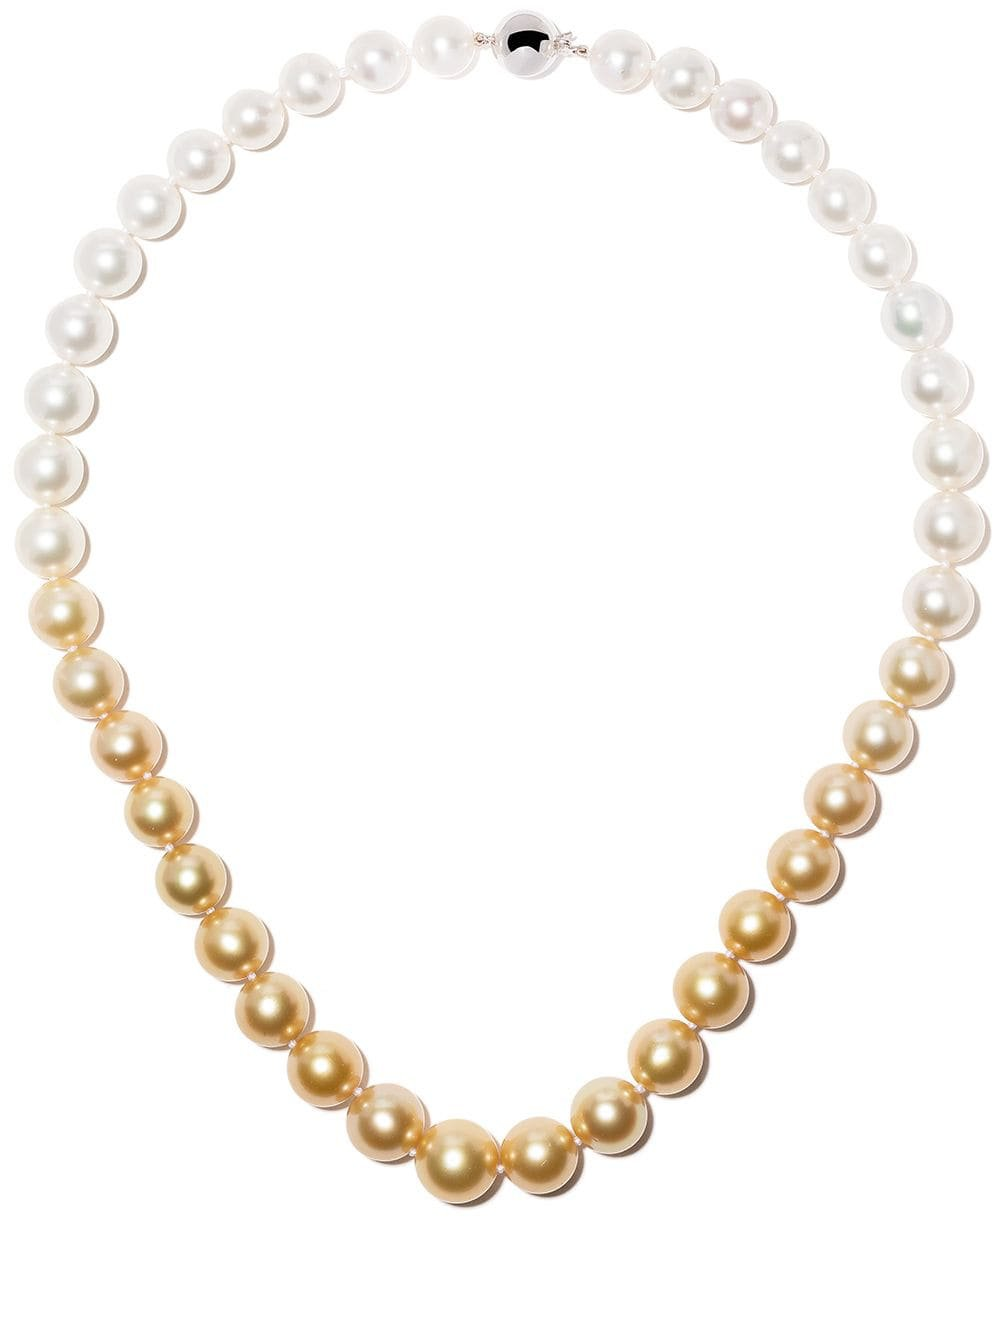 Yoko London 18kt White Gold Ombré South Sea Pearl Necklace - Farfetch